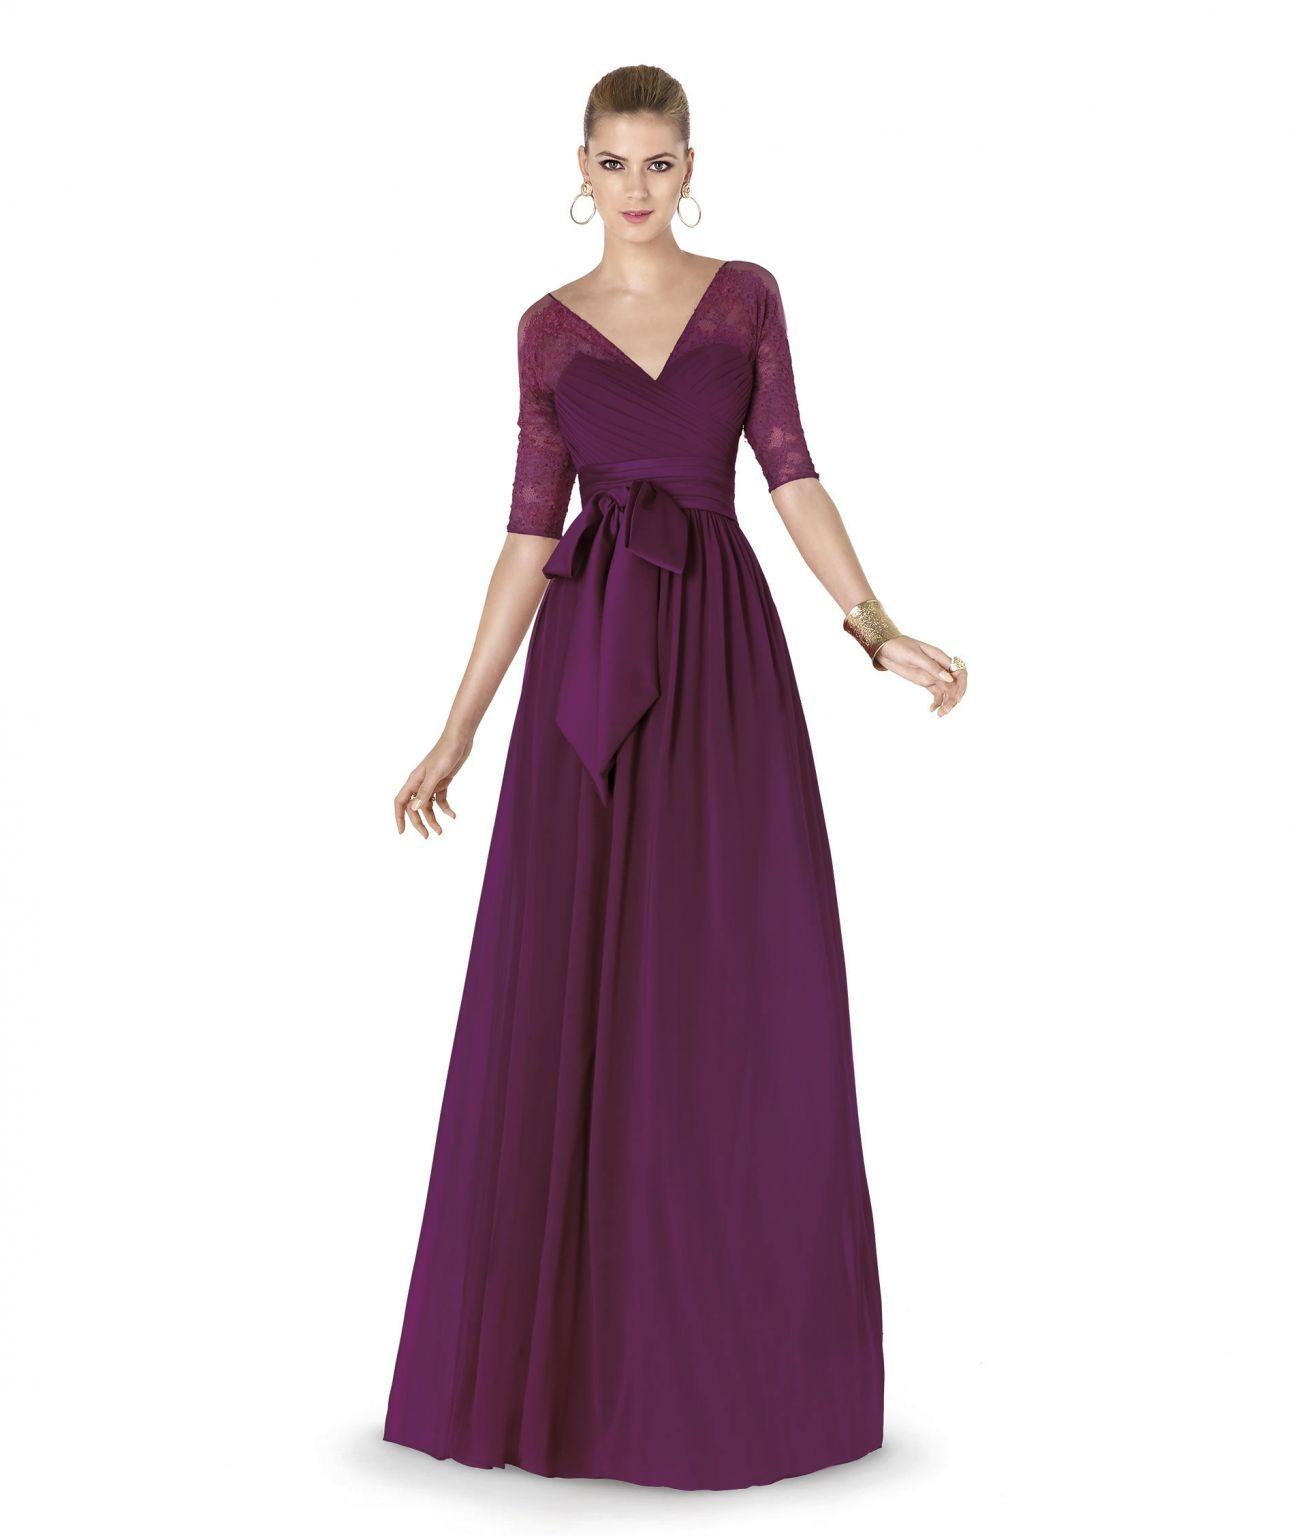 Pronovias ALENA, Size: 14 | Bridesmaid Dresses